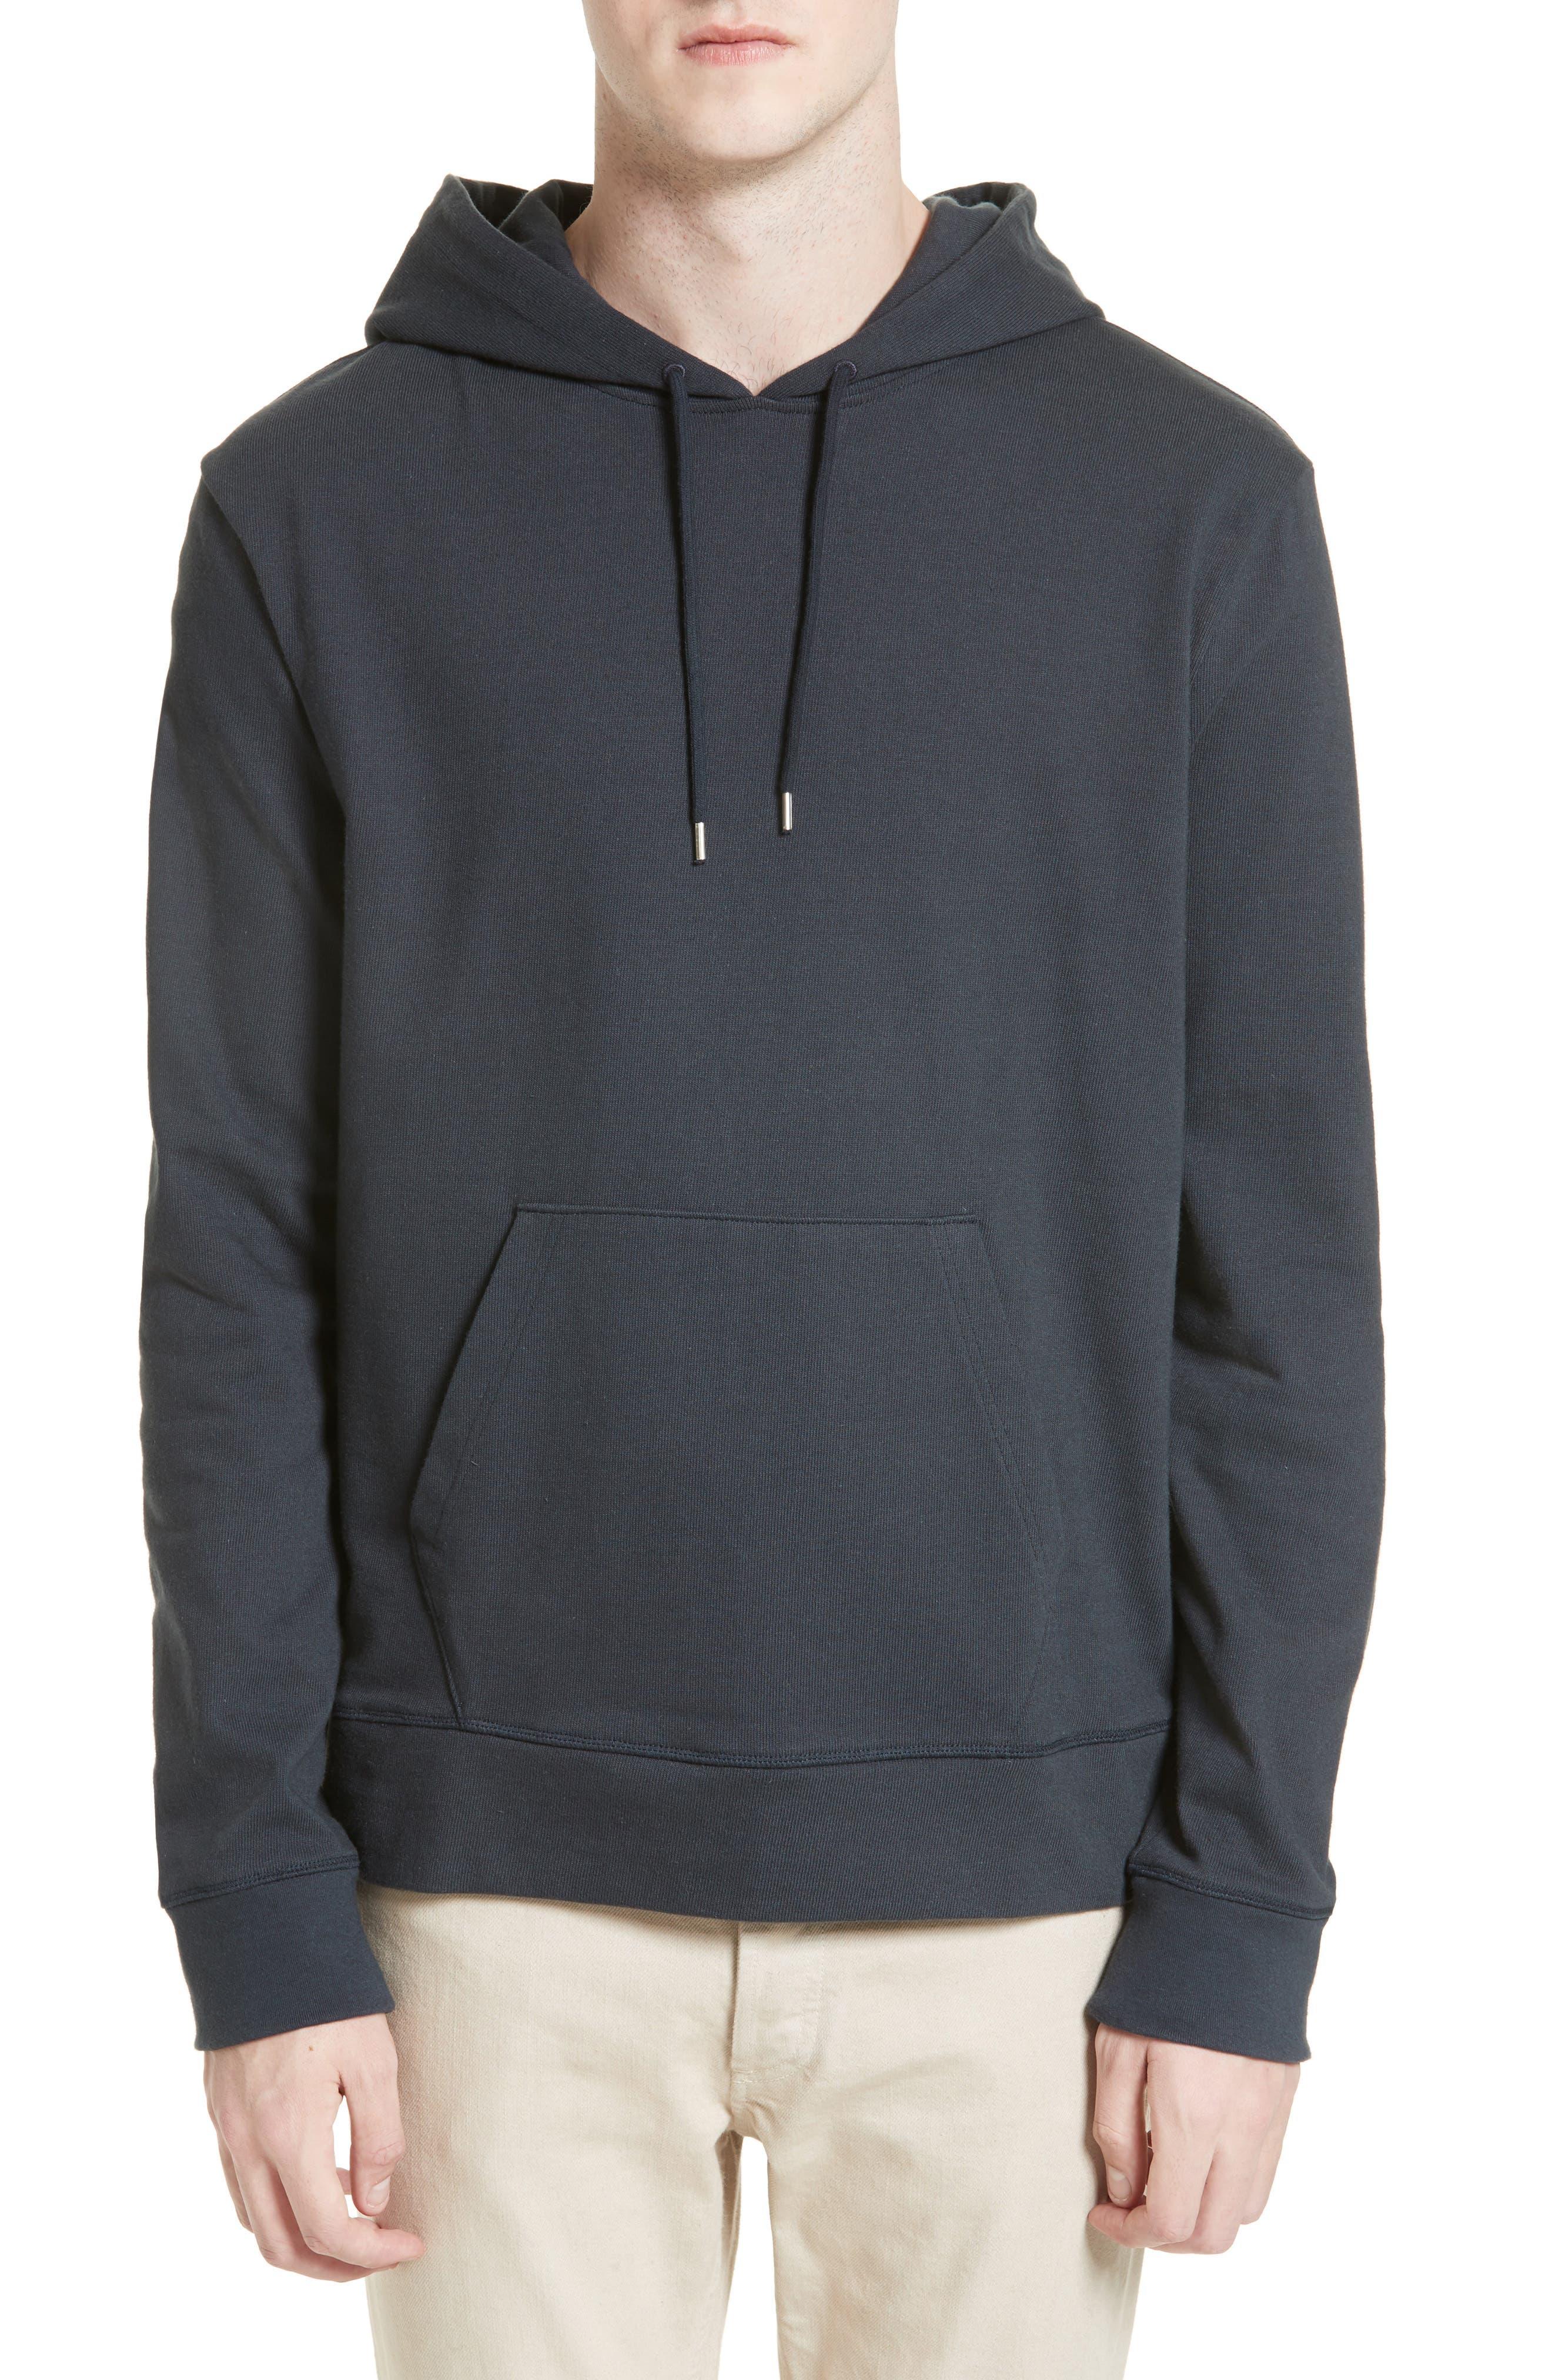 Brody Hooded Sweatshirt,                             Main thumbnail 1, color,                             020